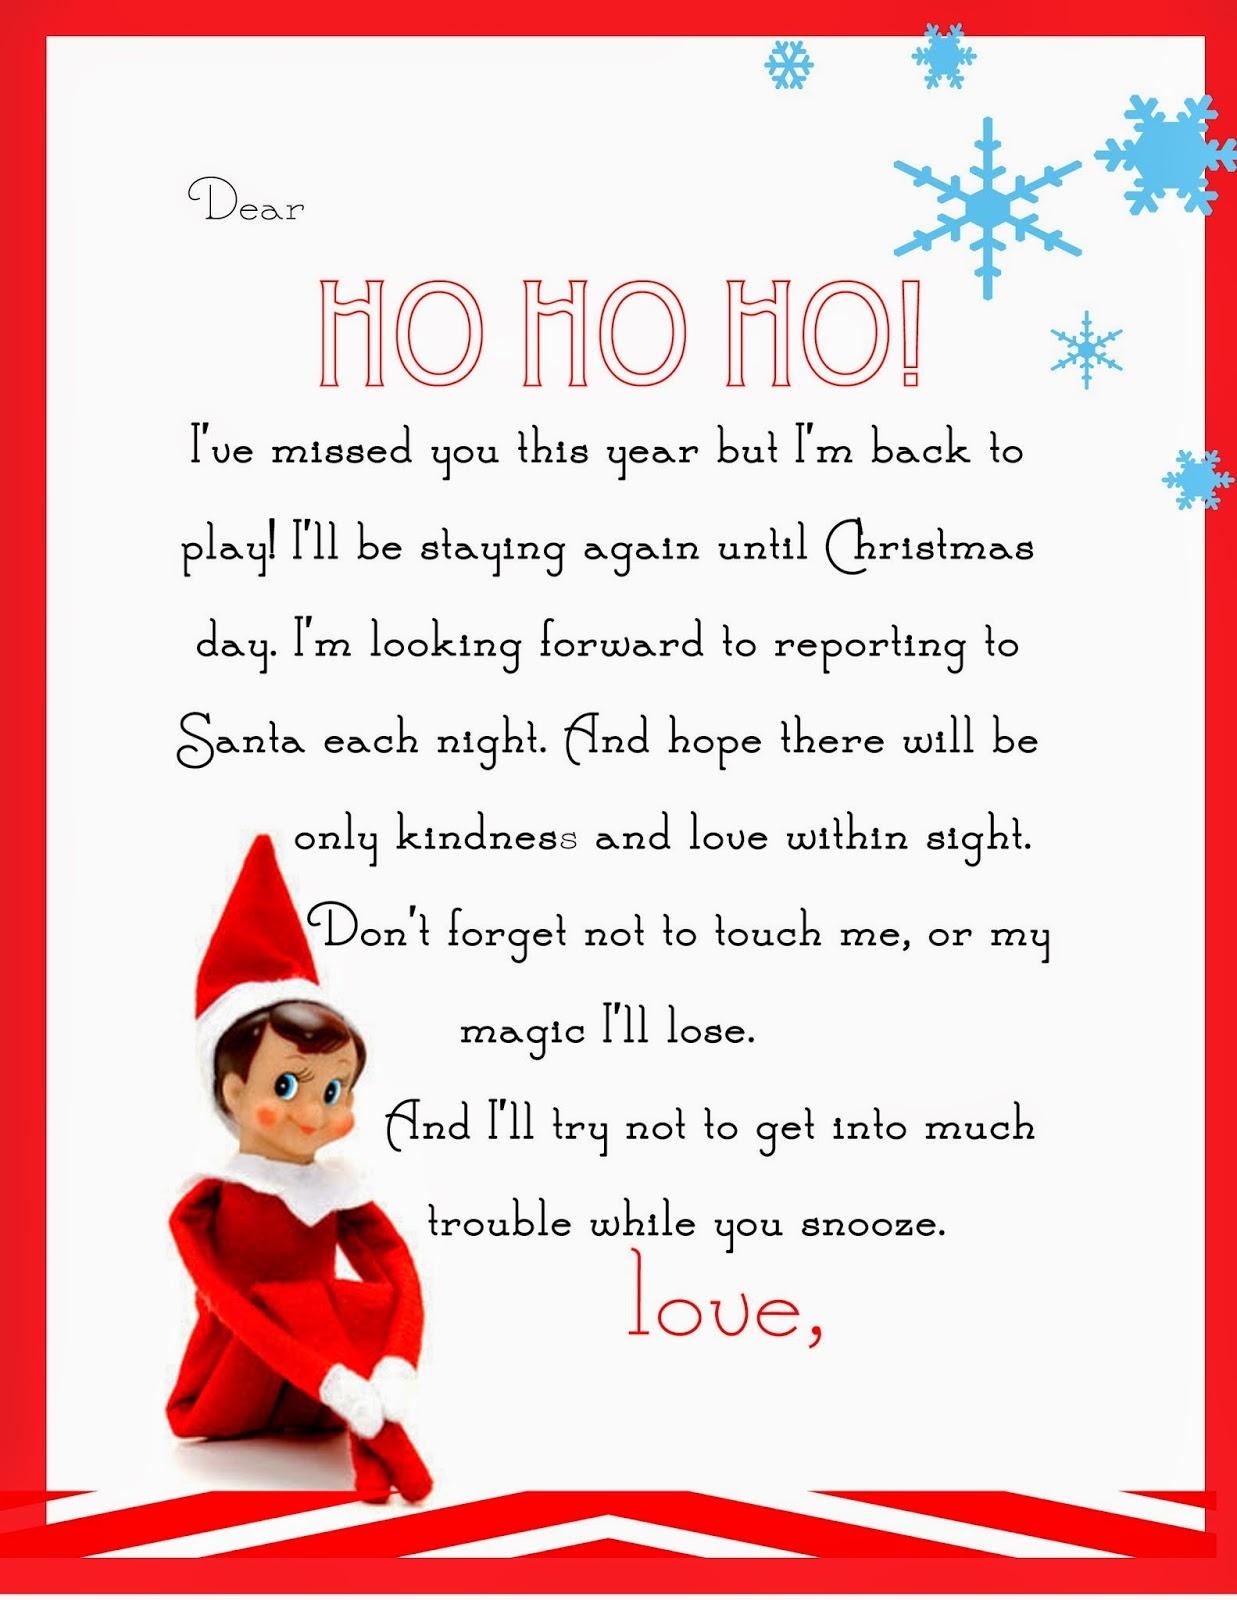 Elf On The Shelf Letter {Free Printable} - Free Printable Elf On The Shelf Notes